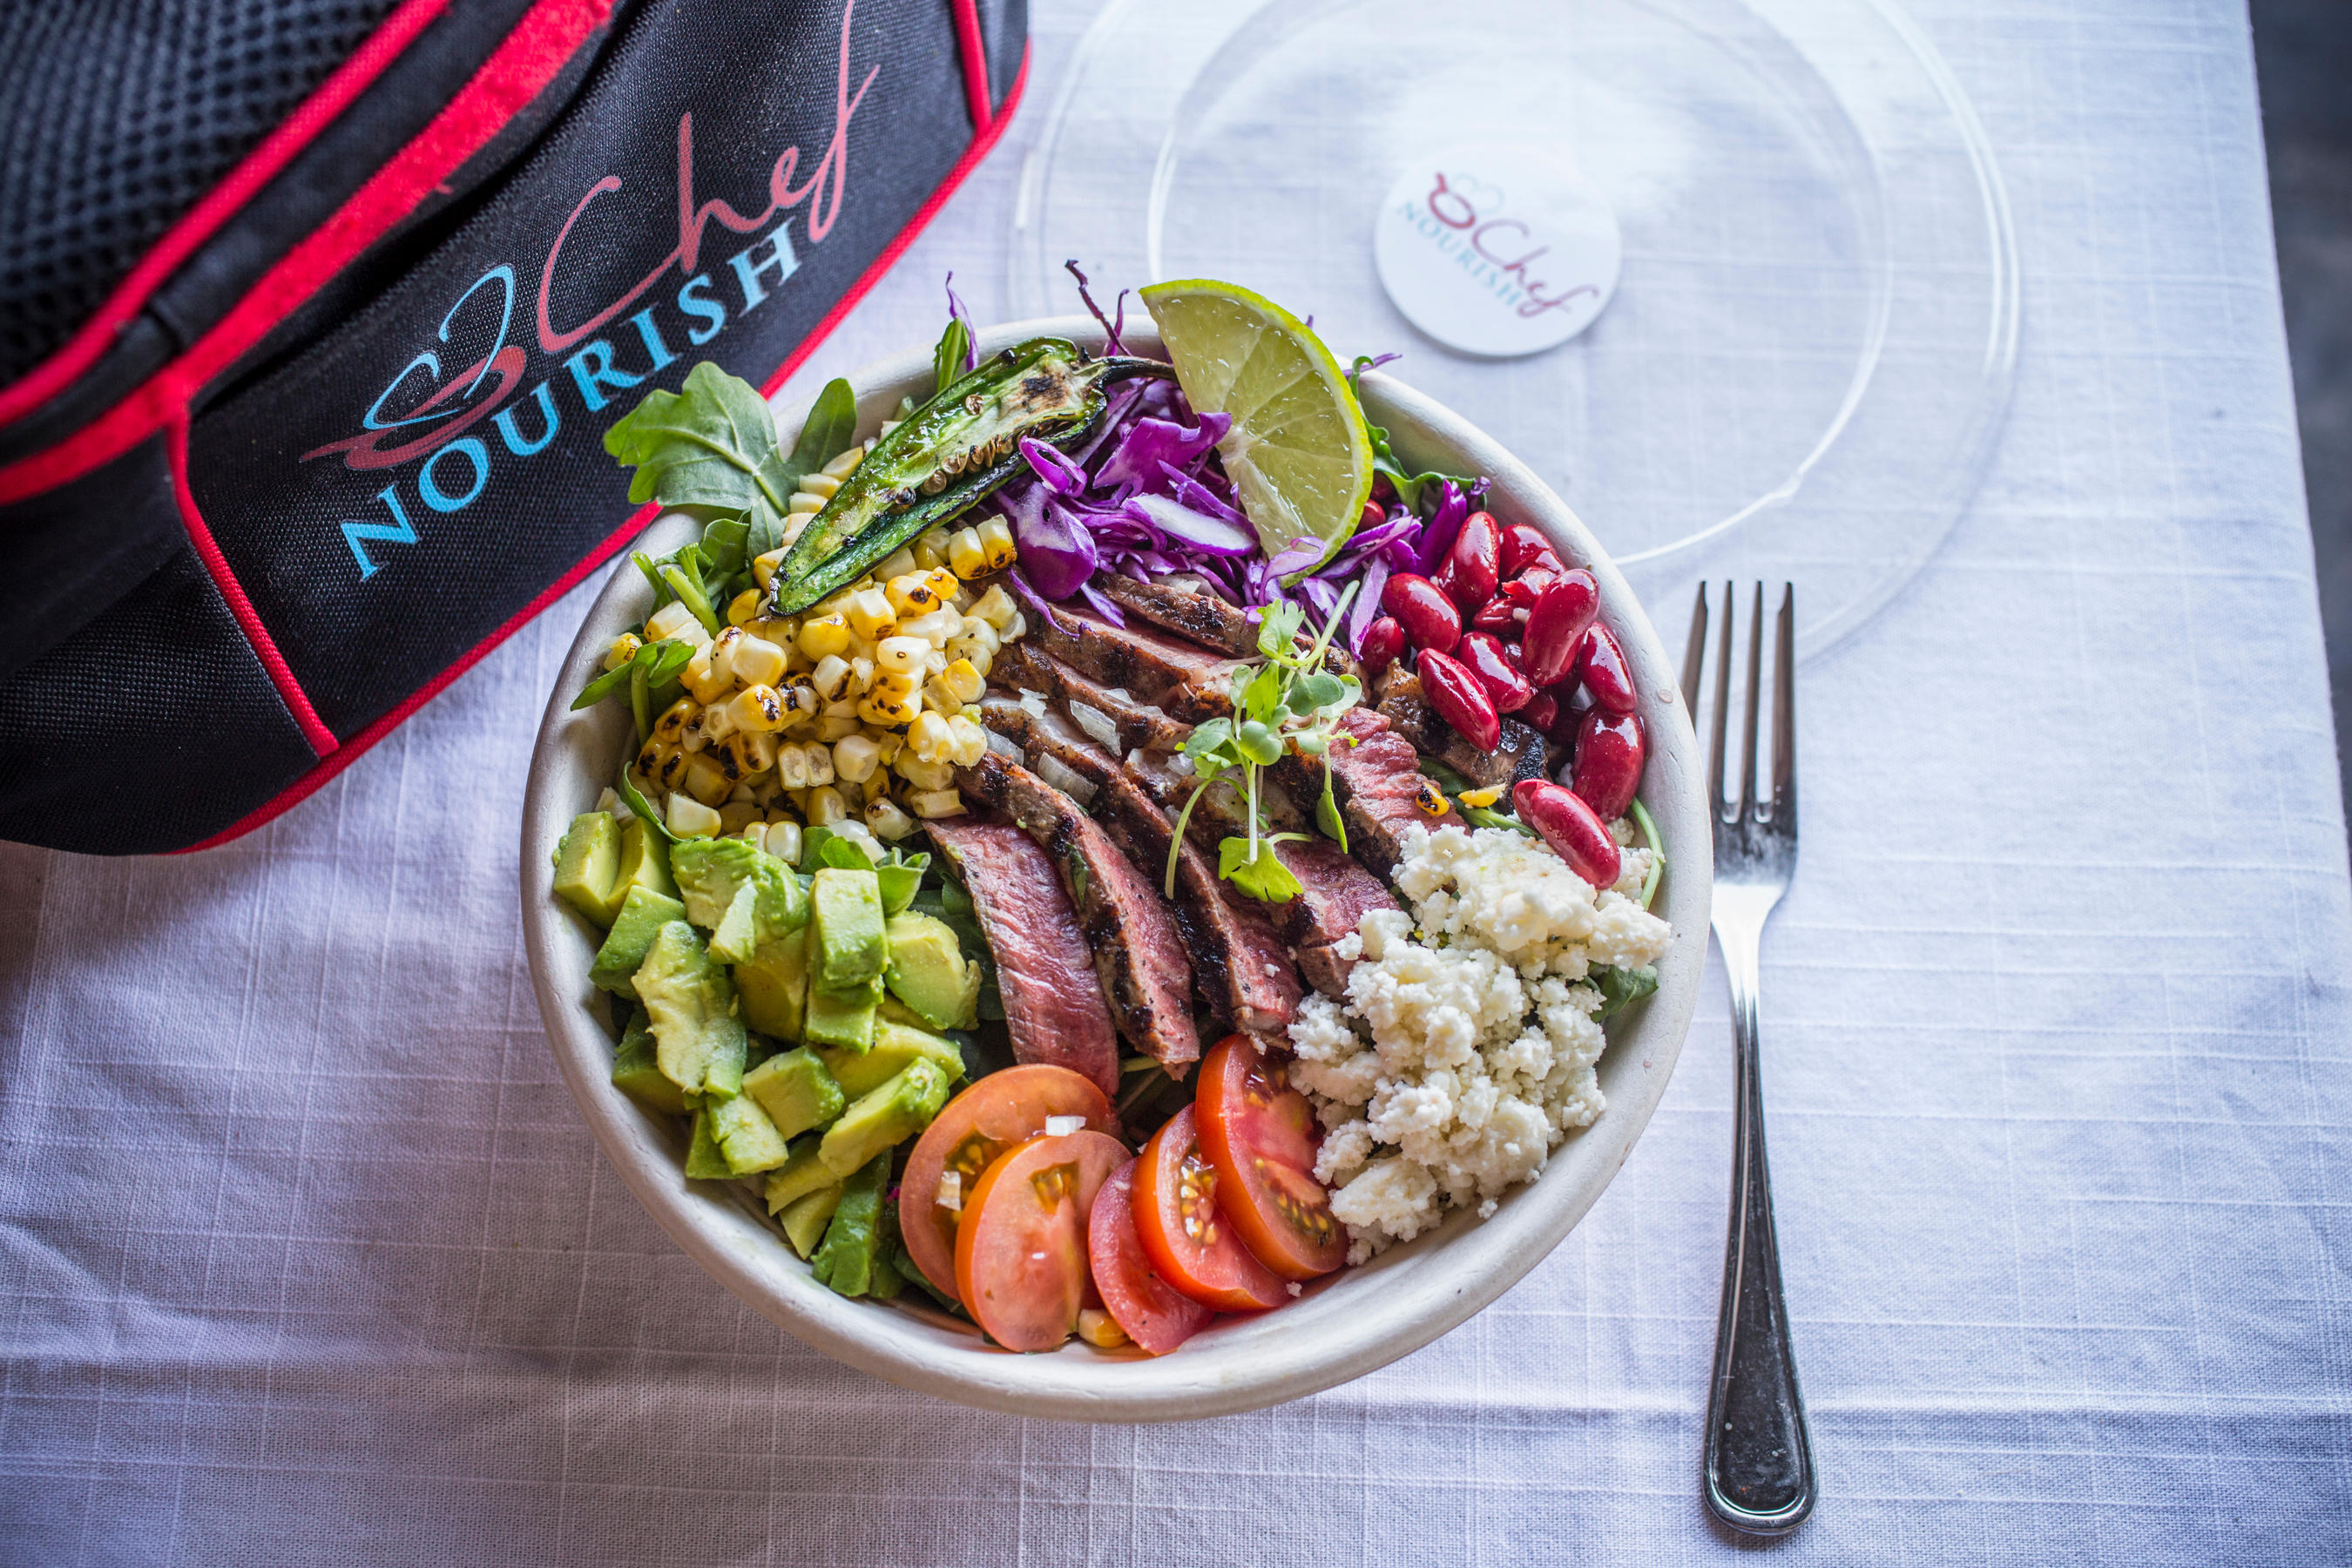 gourmet vegetarian meals - HD2700×1800